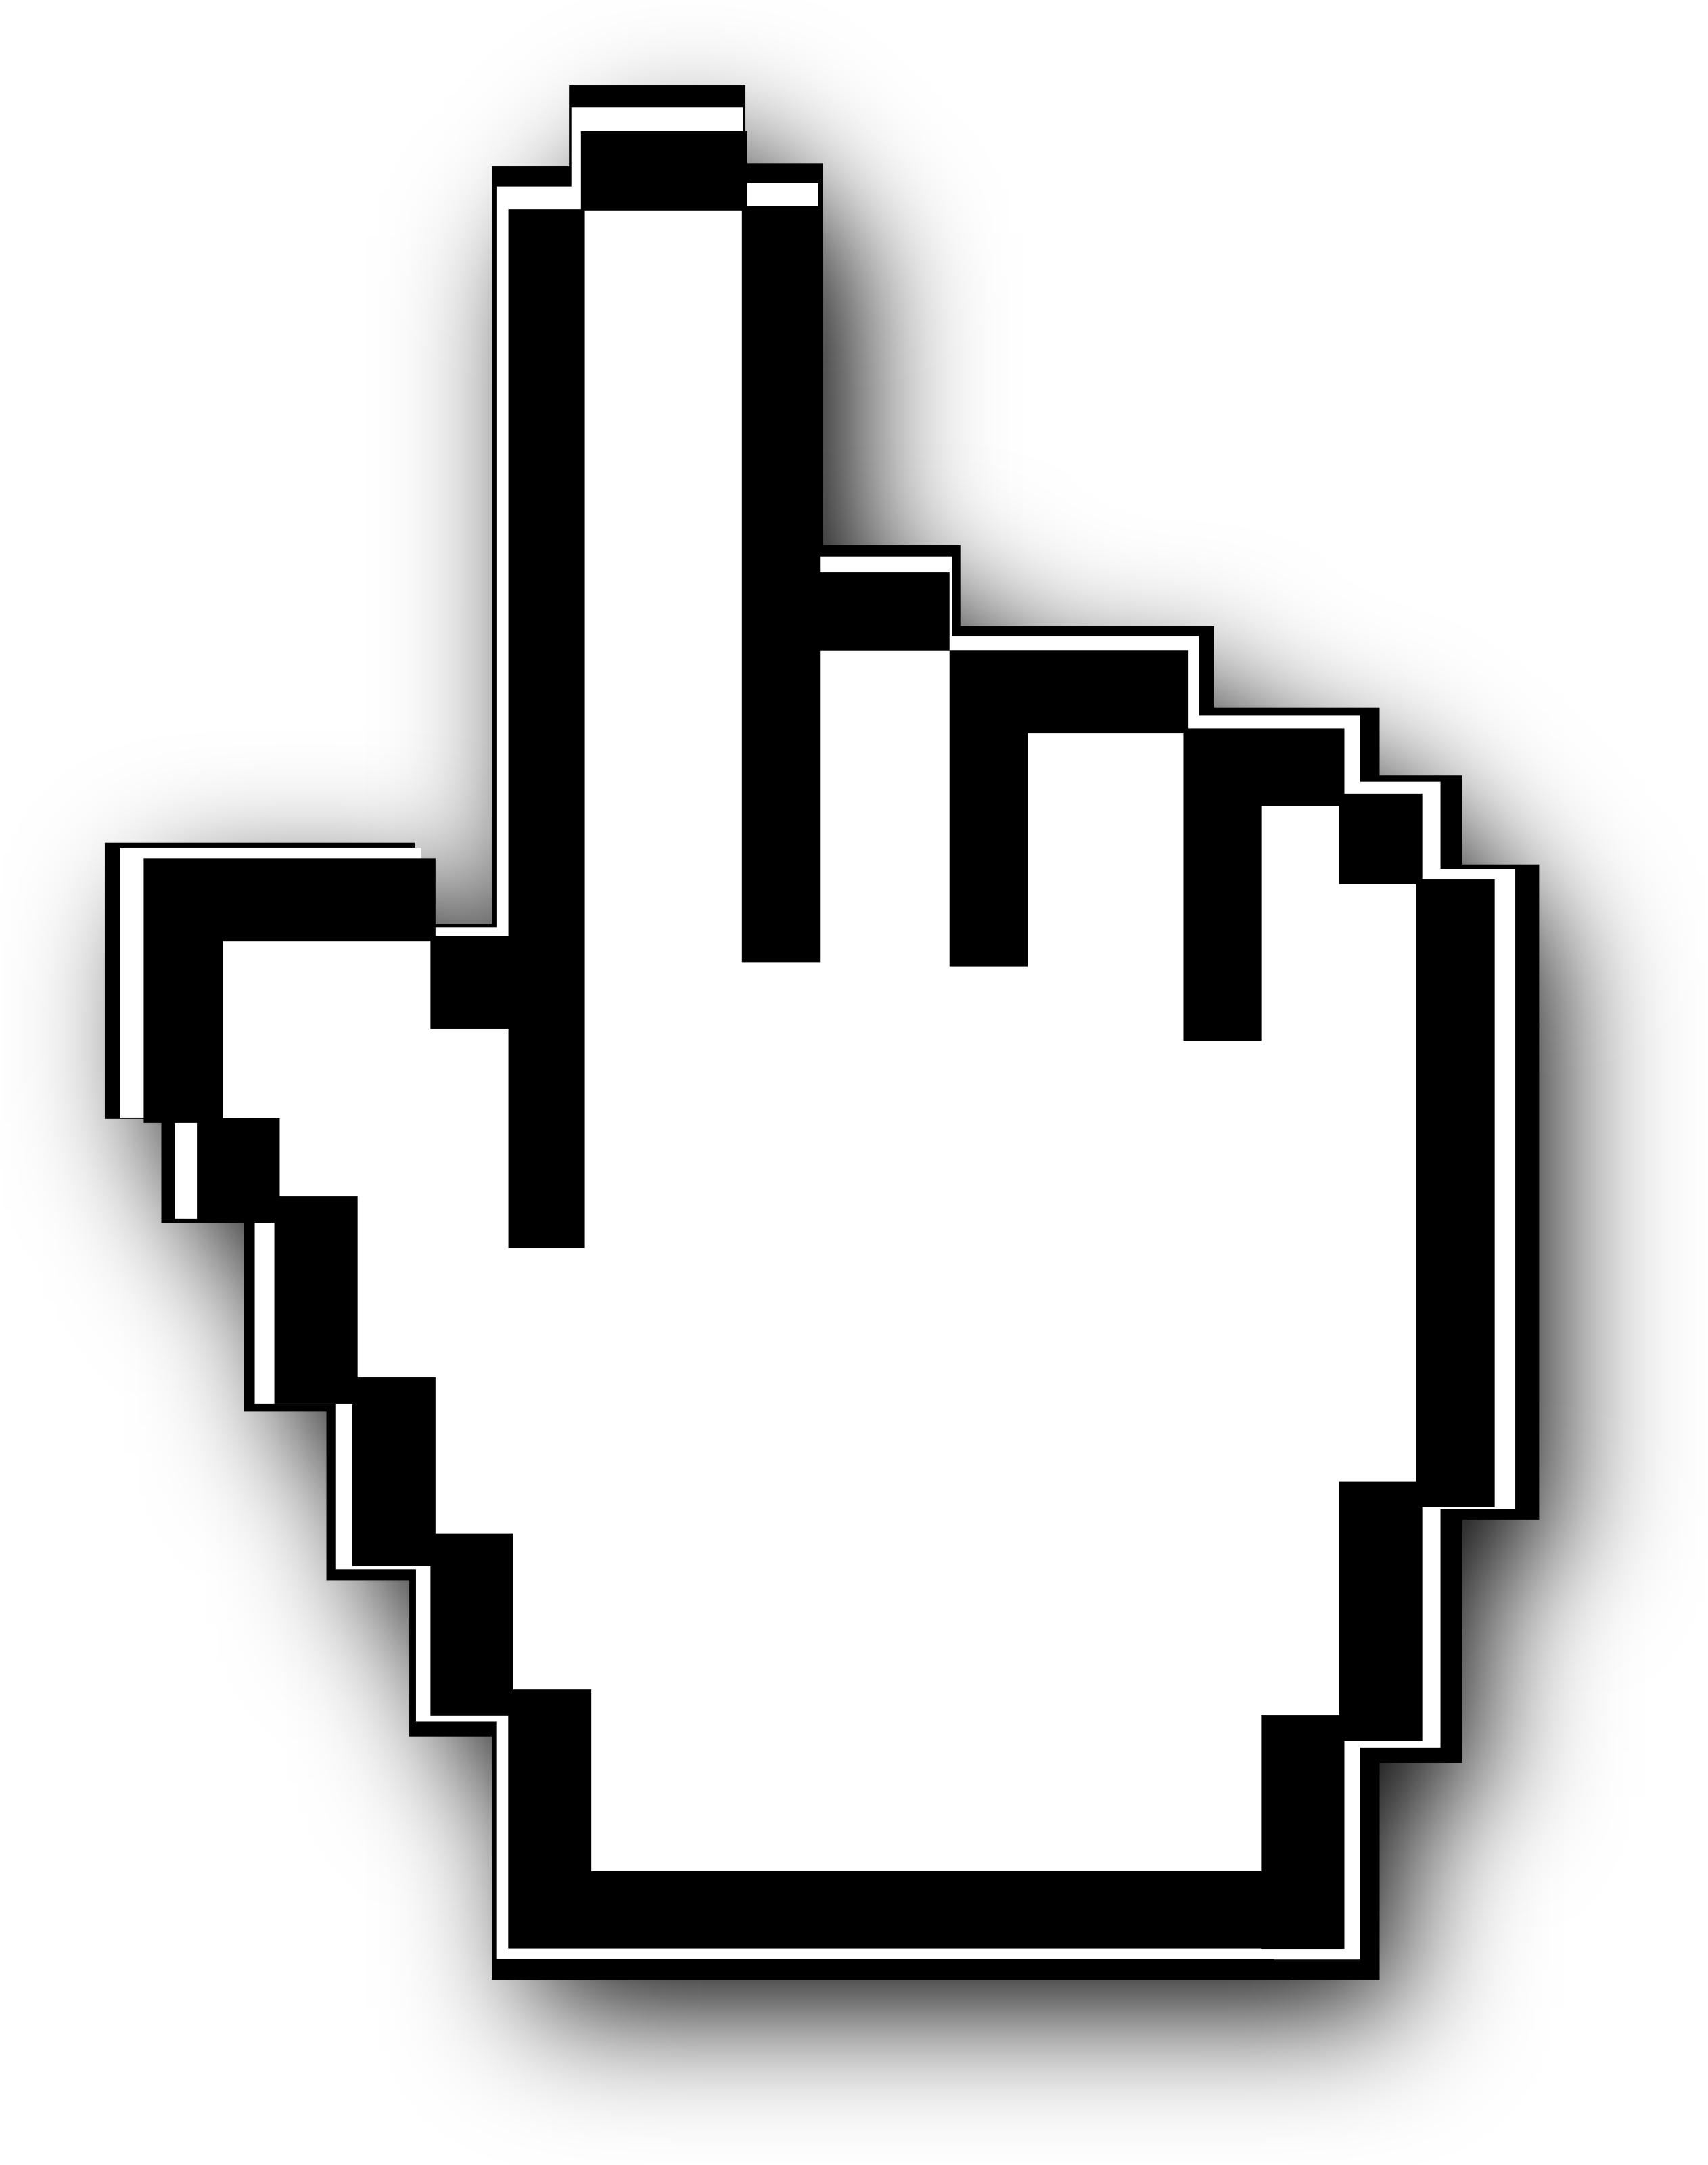 Mouse click clip art.